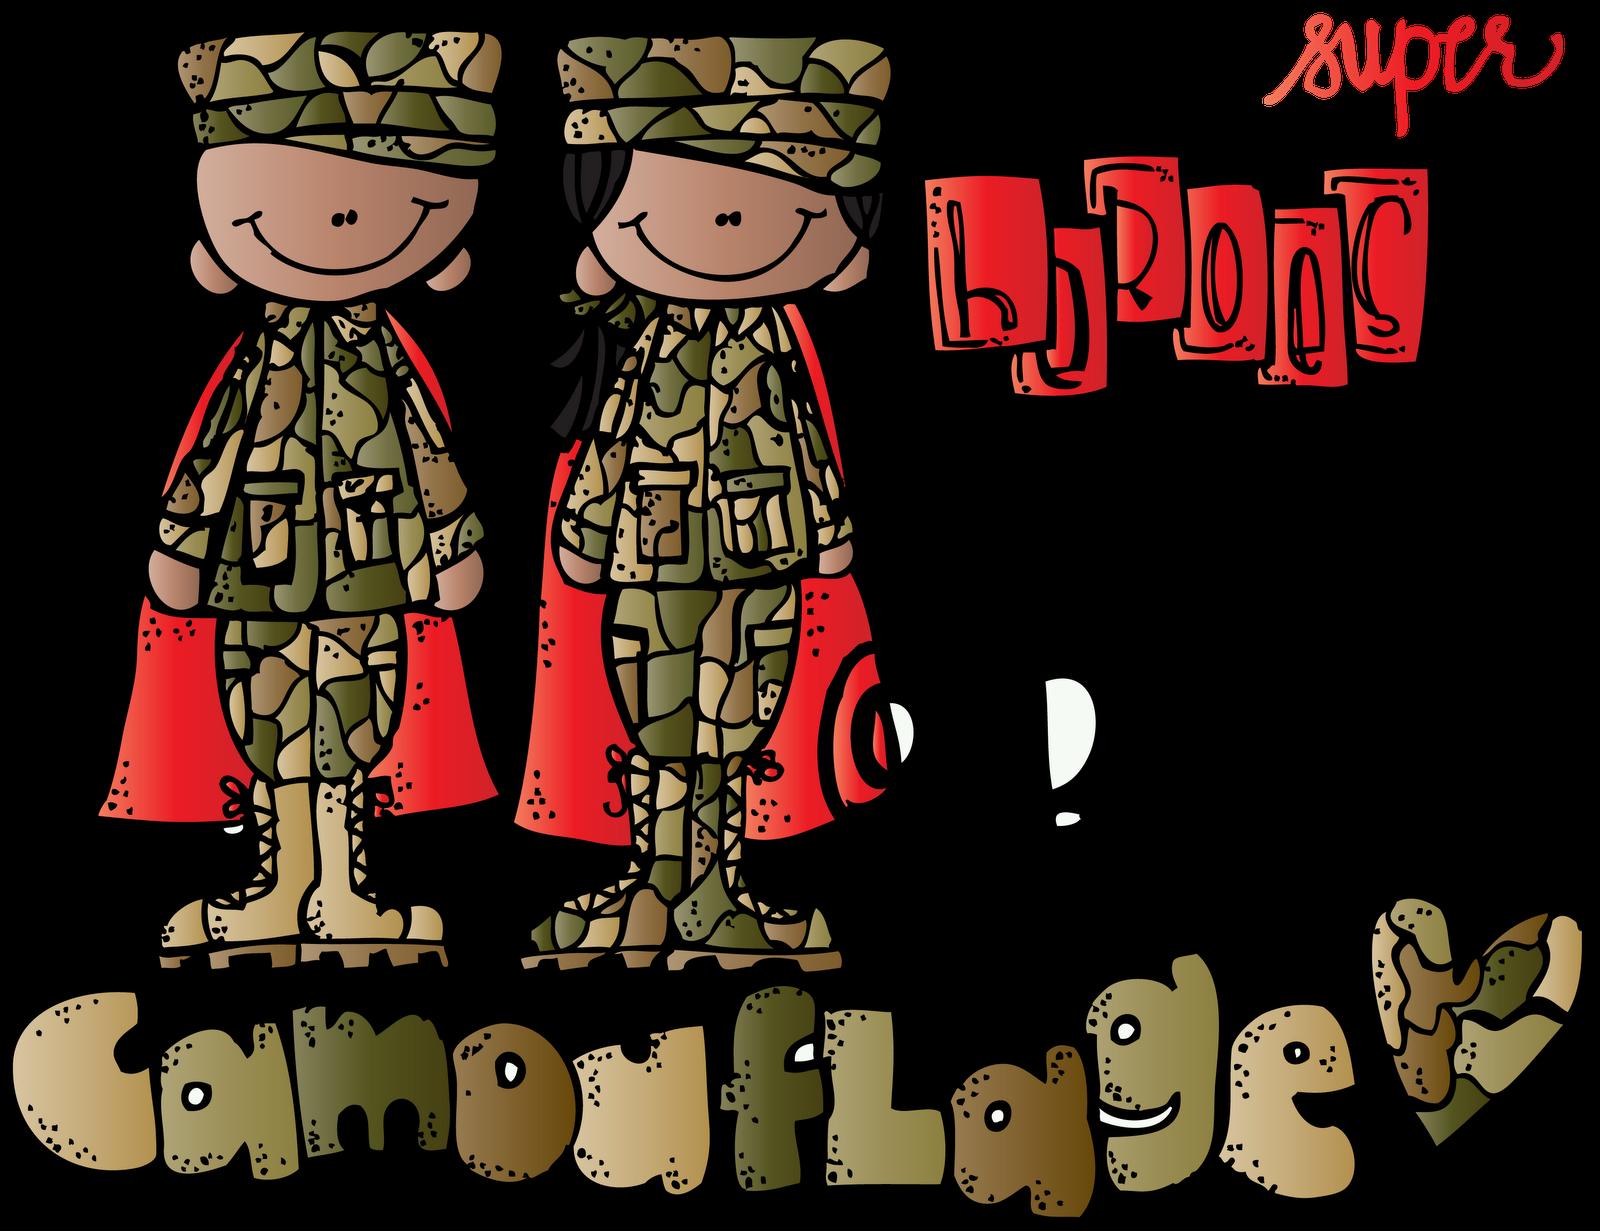 banner free download Veterans clipart. Melonheadz happy day better.